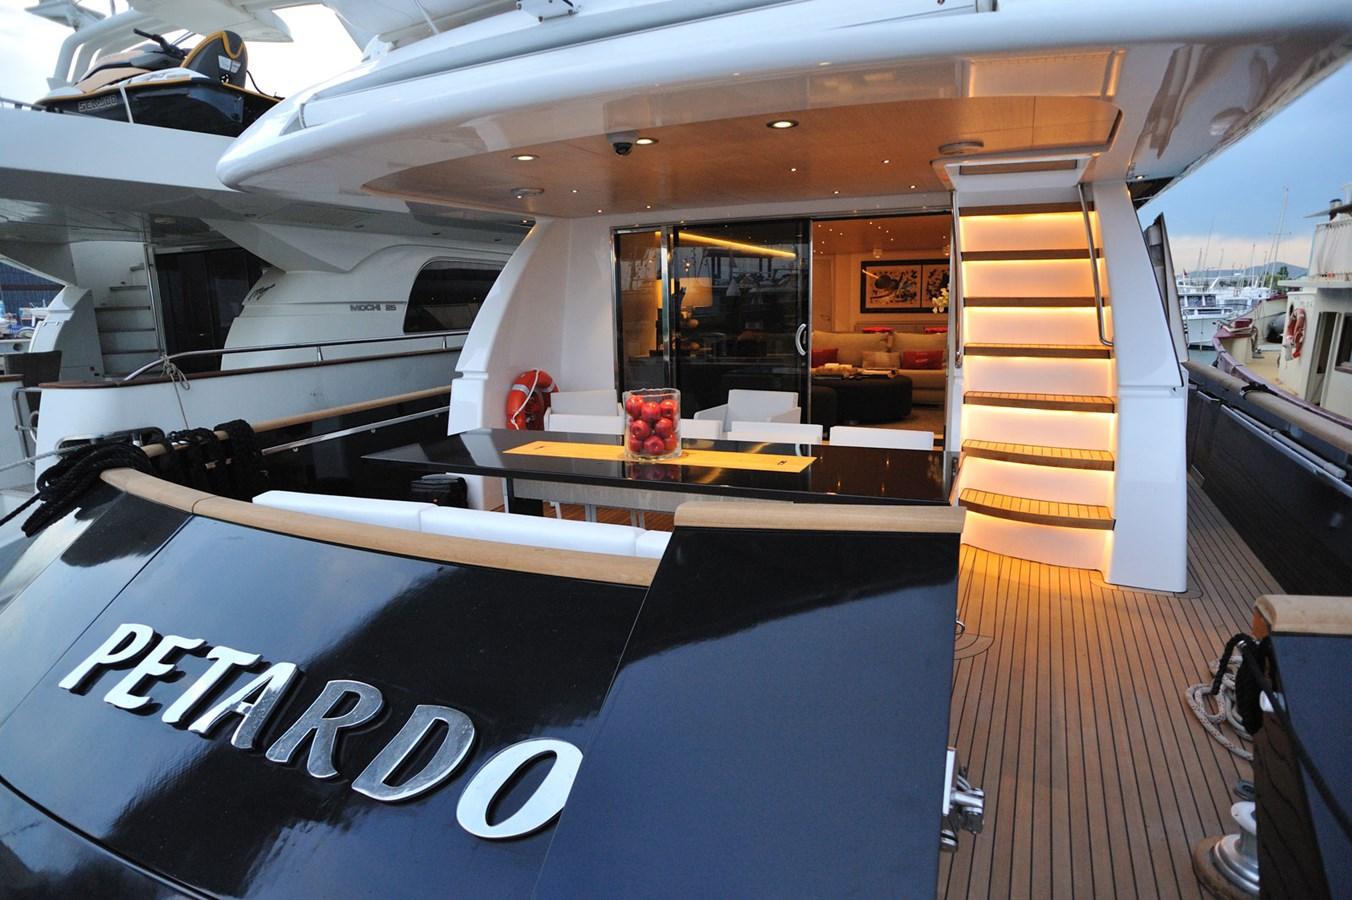 Mondomarine 85 Petardo - Exterior 1995 MondoMarine 85 C Motor Yacht 2735398